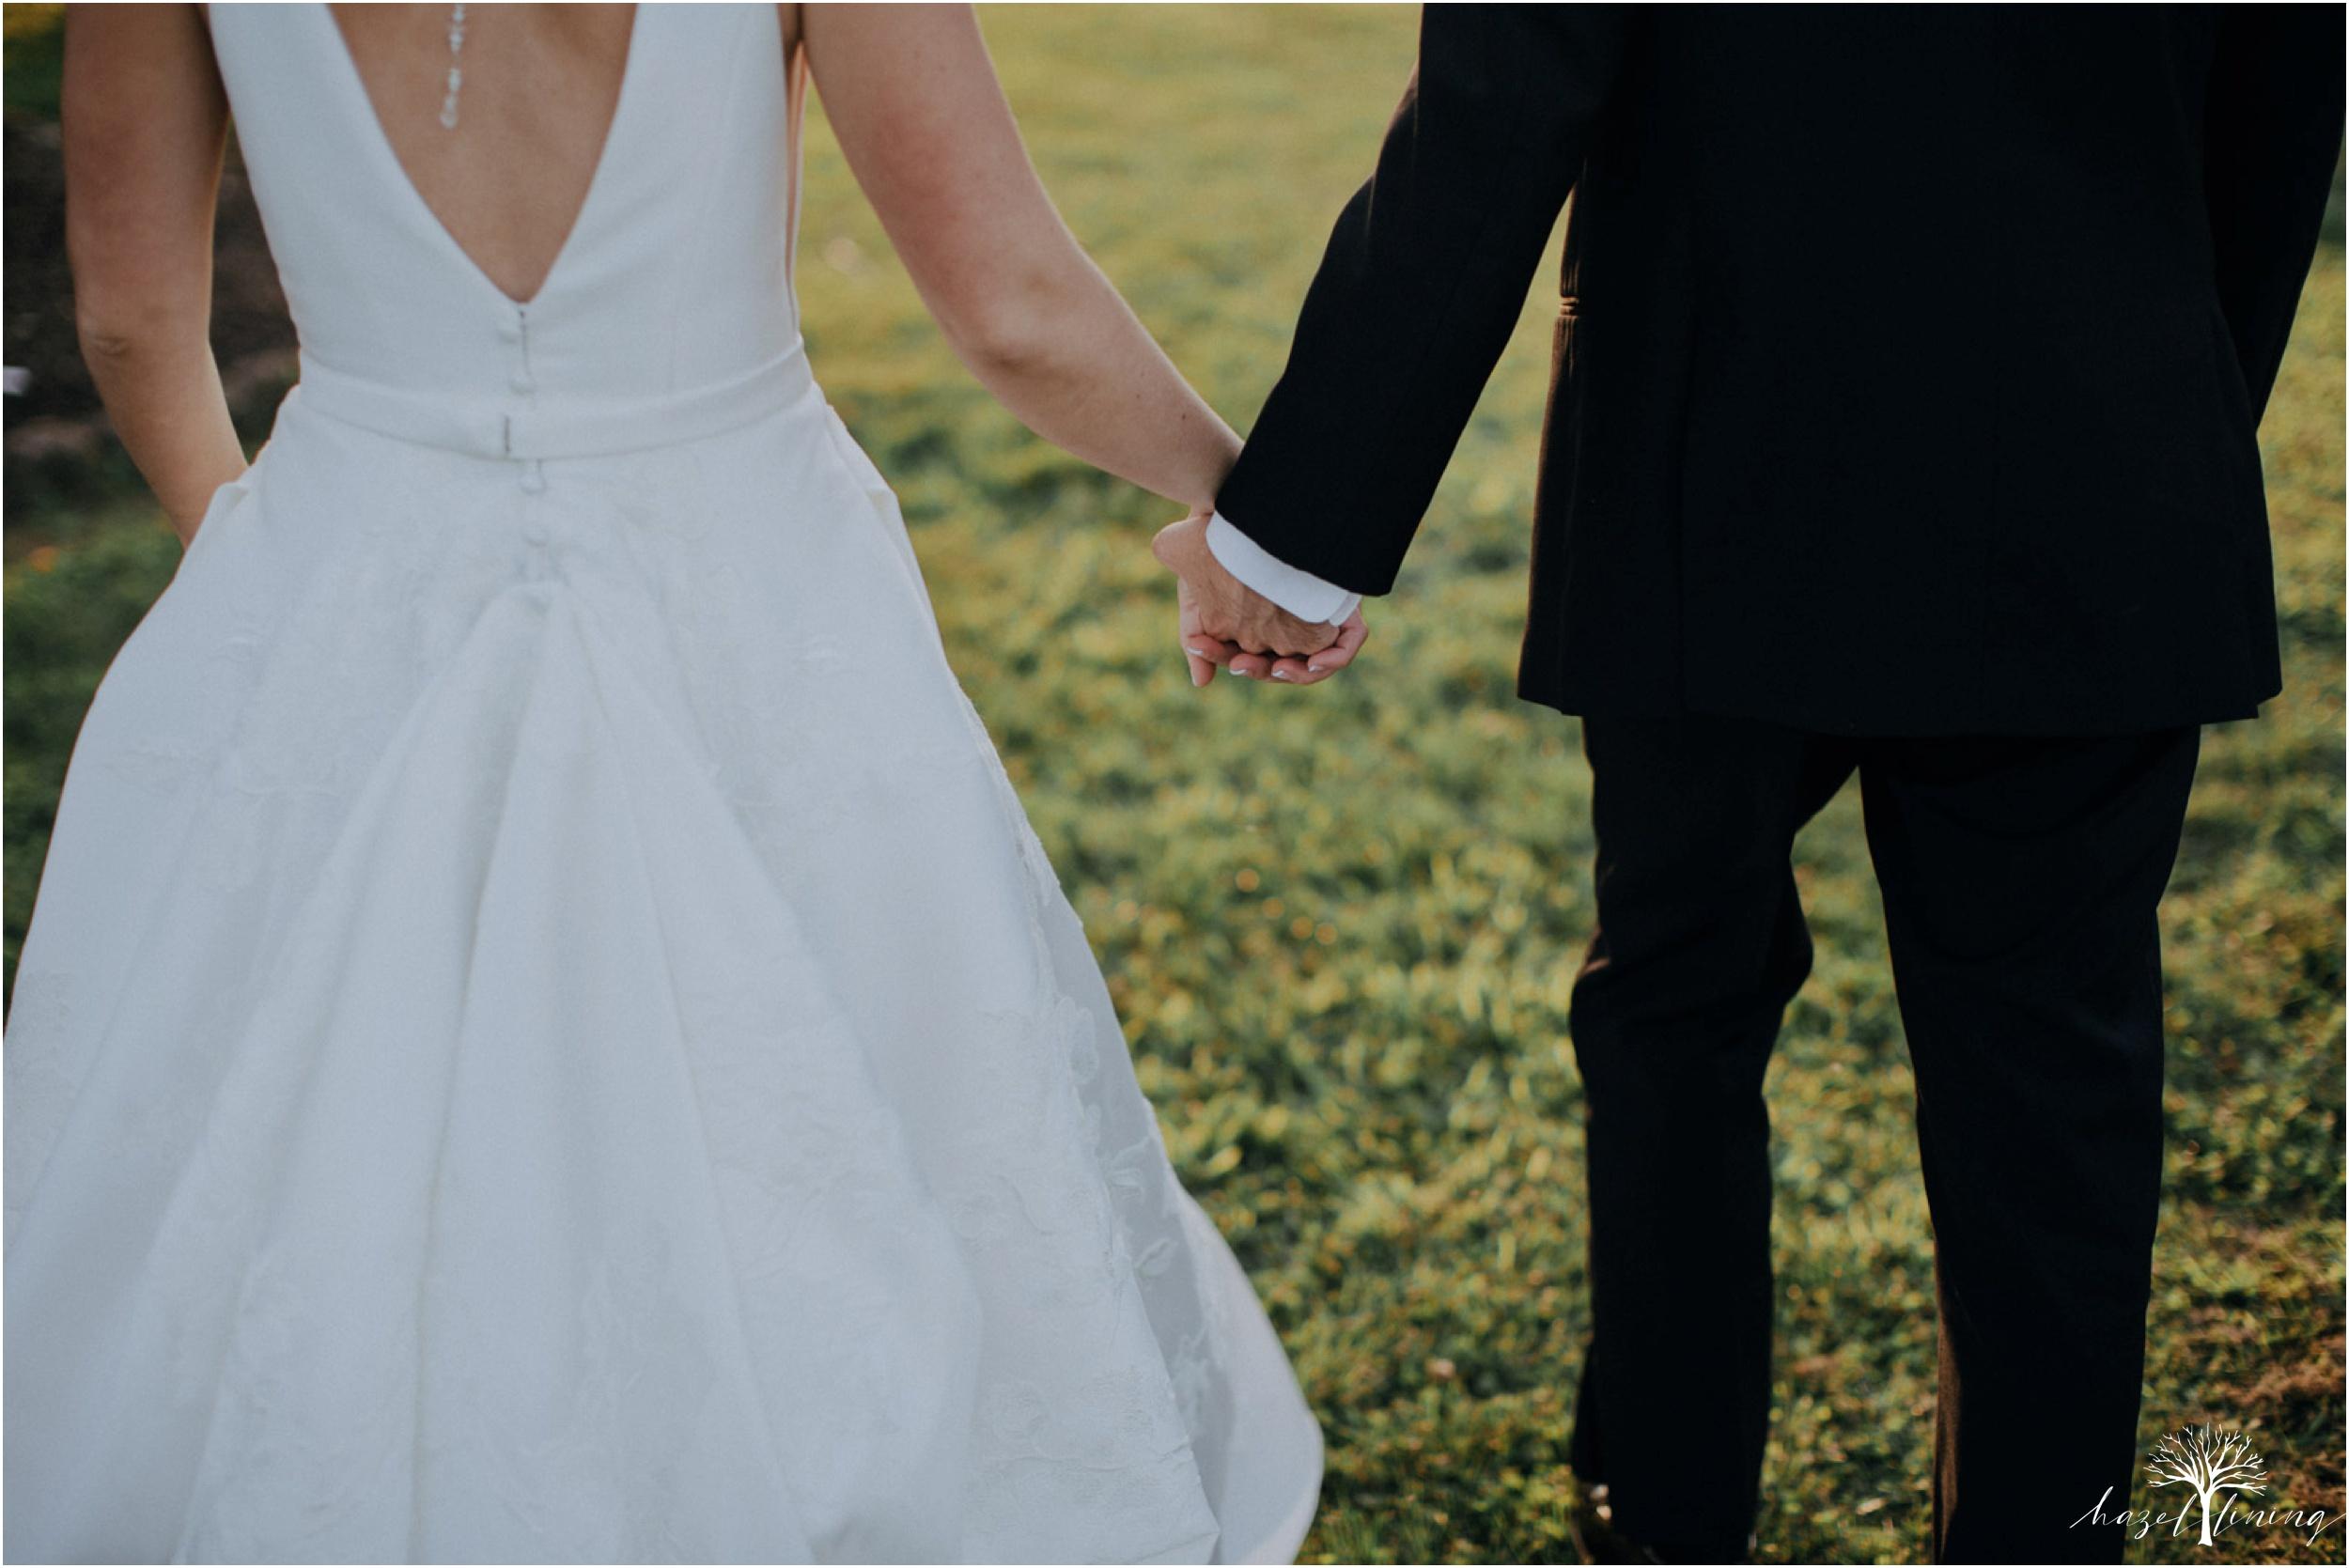 maureen-hepner-anthony-giordano-rose-bank-winery-newtow-pennsylvania-luxury-summer-wedding-hazel-lining-photography-destination-elopement-wedding-engagement-photography_0164.jpg